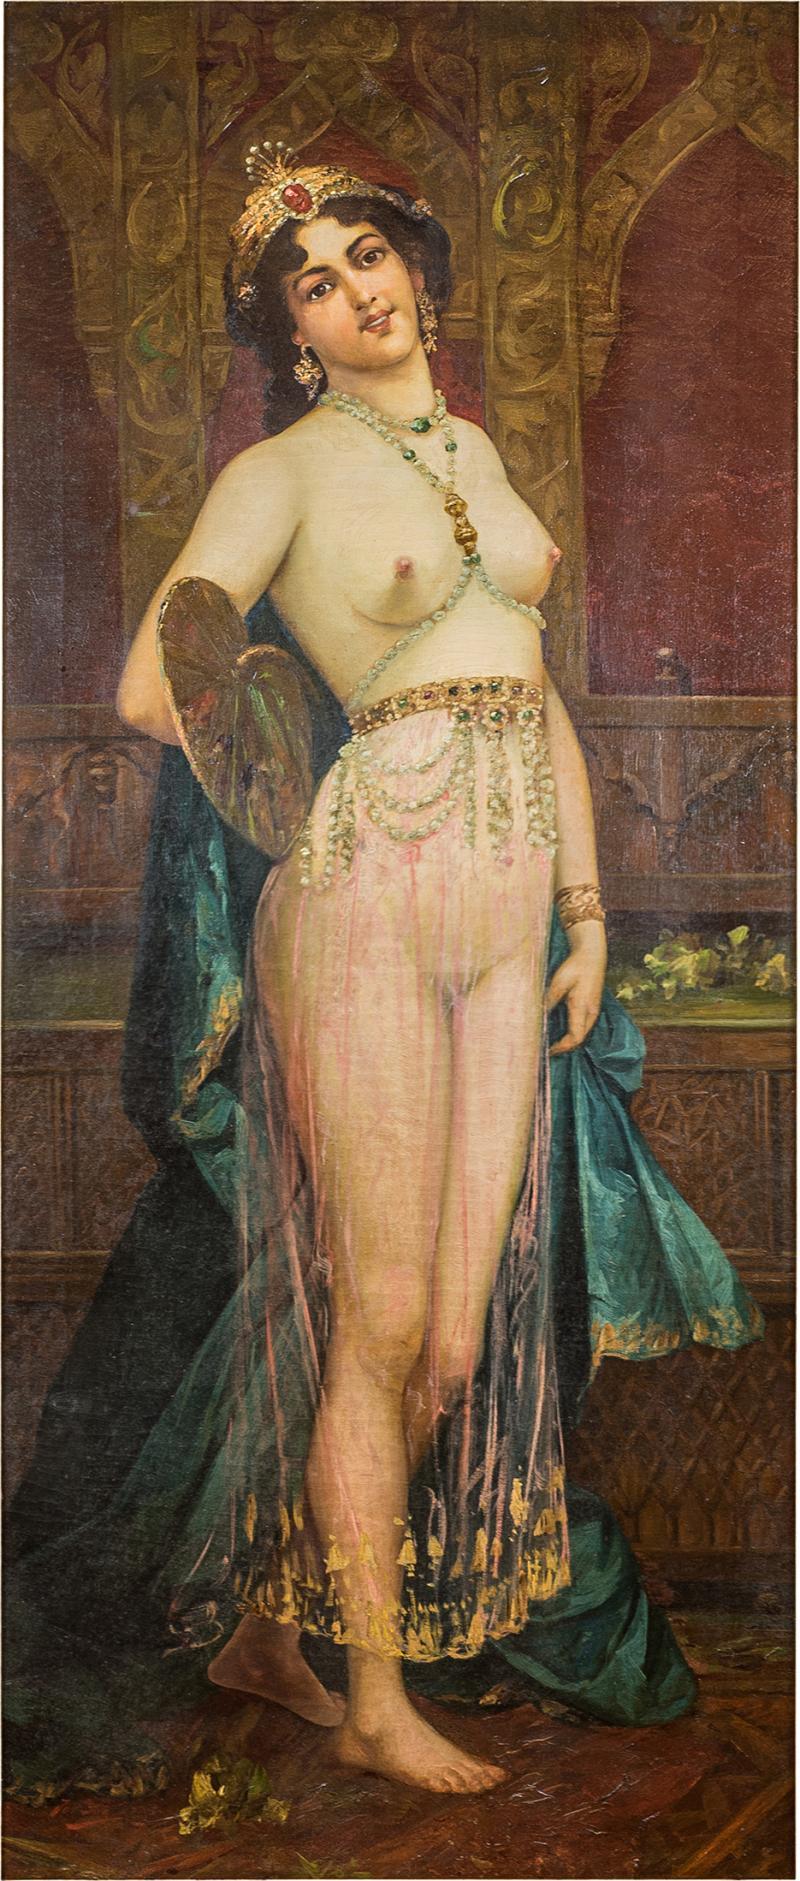 A Fine Orientalist Painting of a Beautiful Half Nude Odalisque Holding a Fan